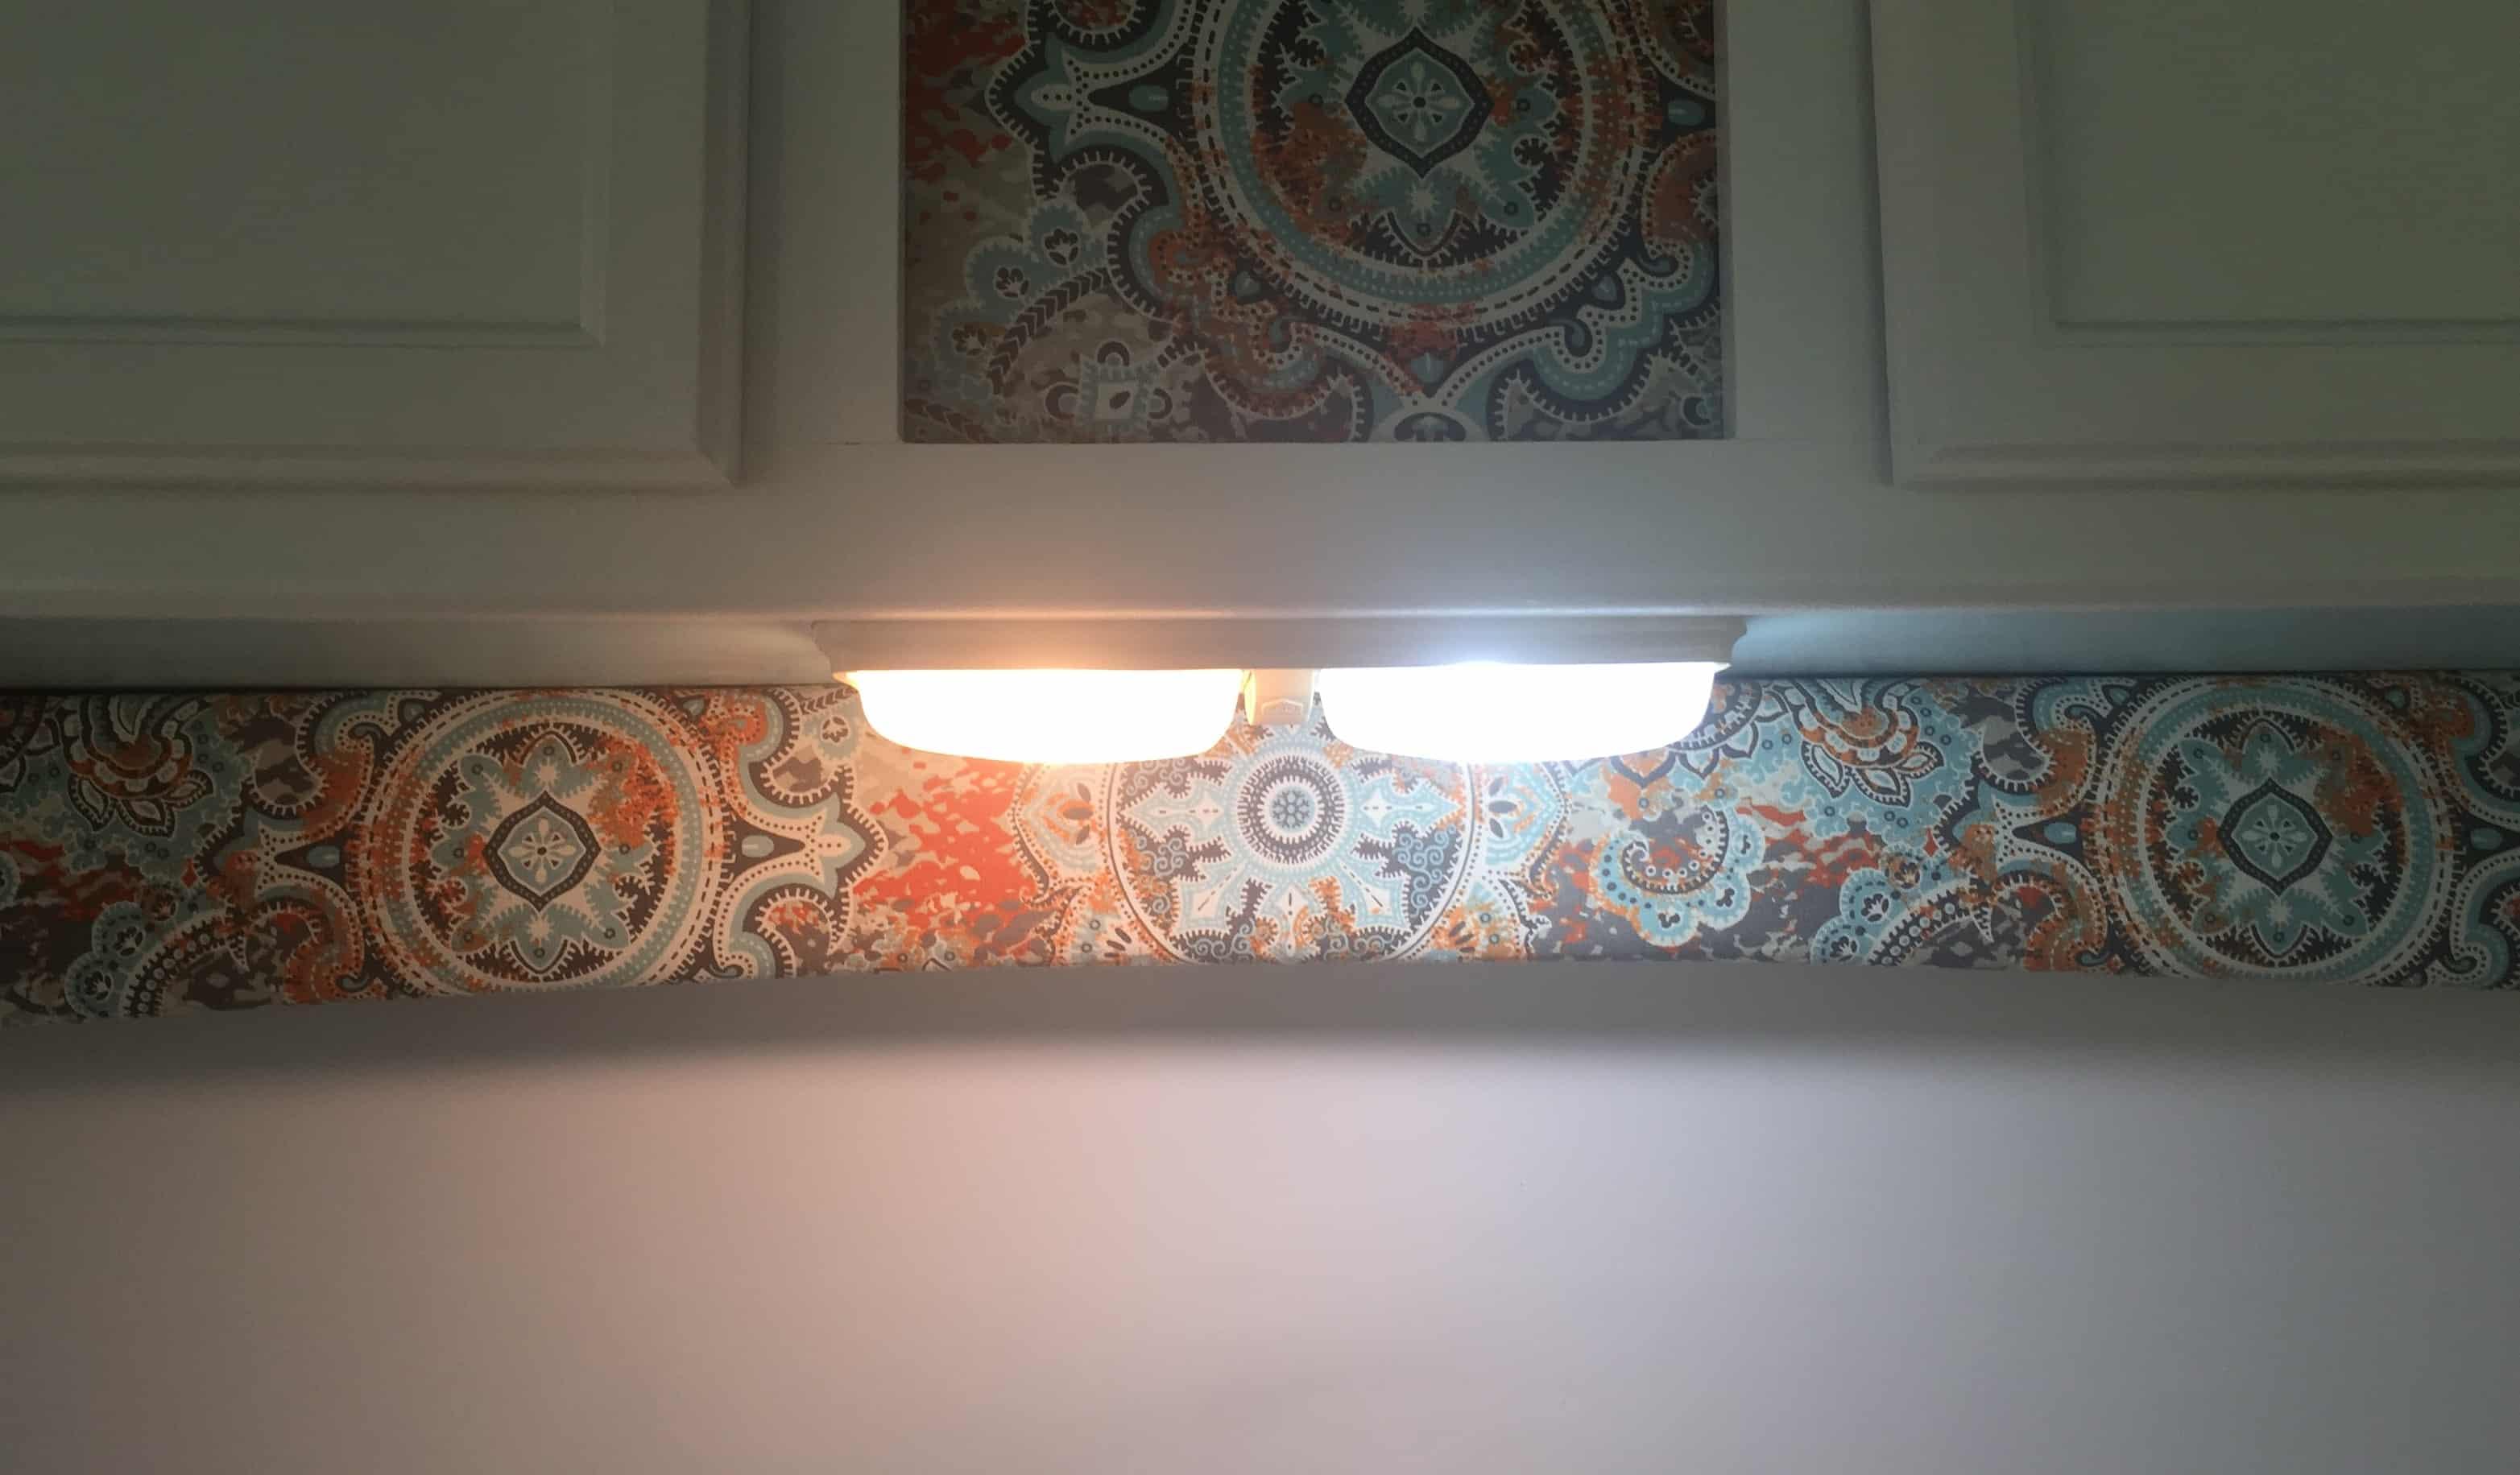 rv interior lightbulbs old next to new